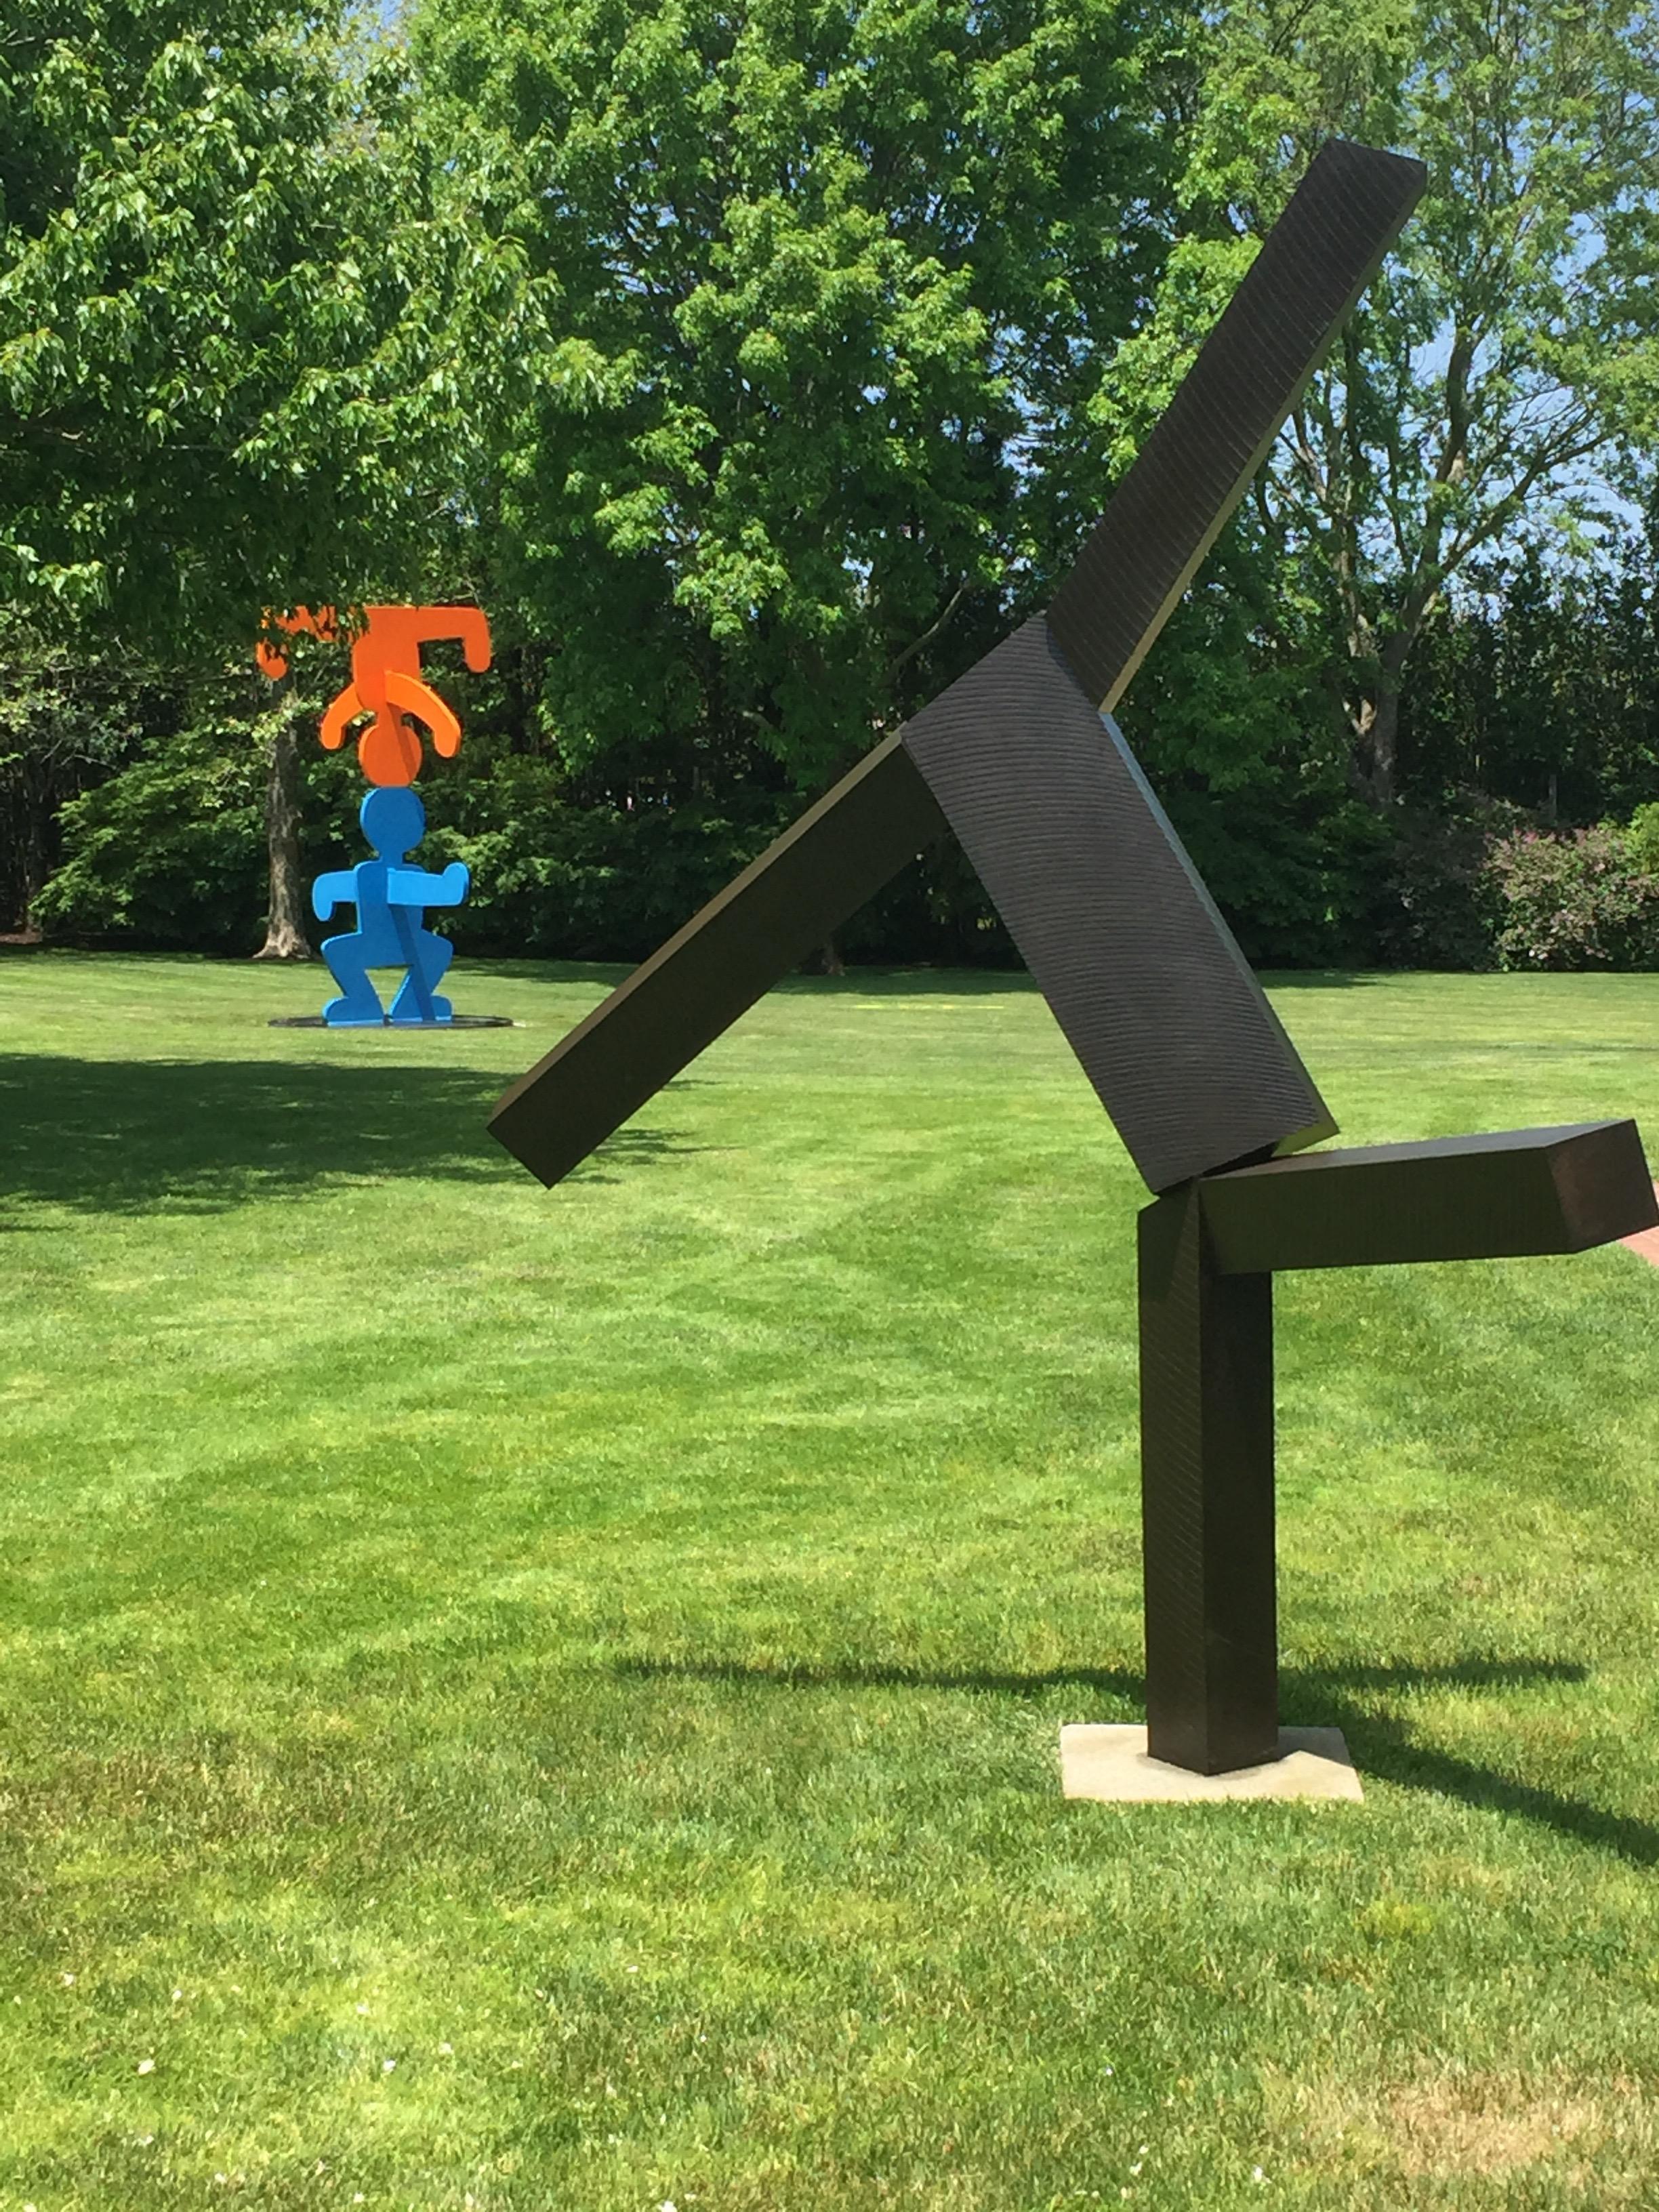 Joel Shapiro and Keith Haring